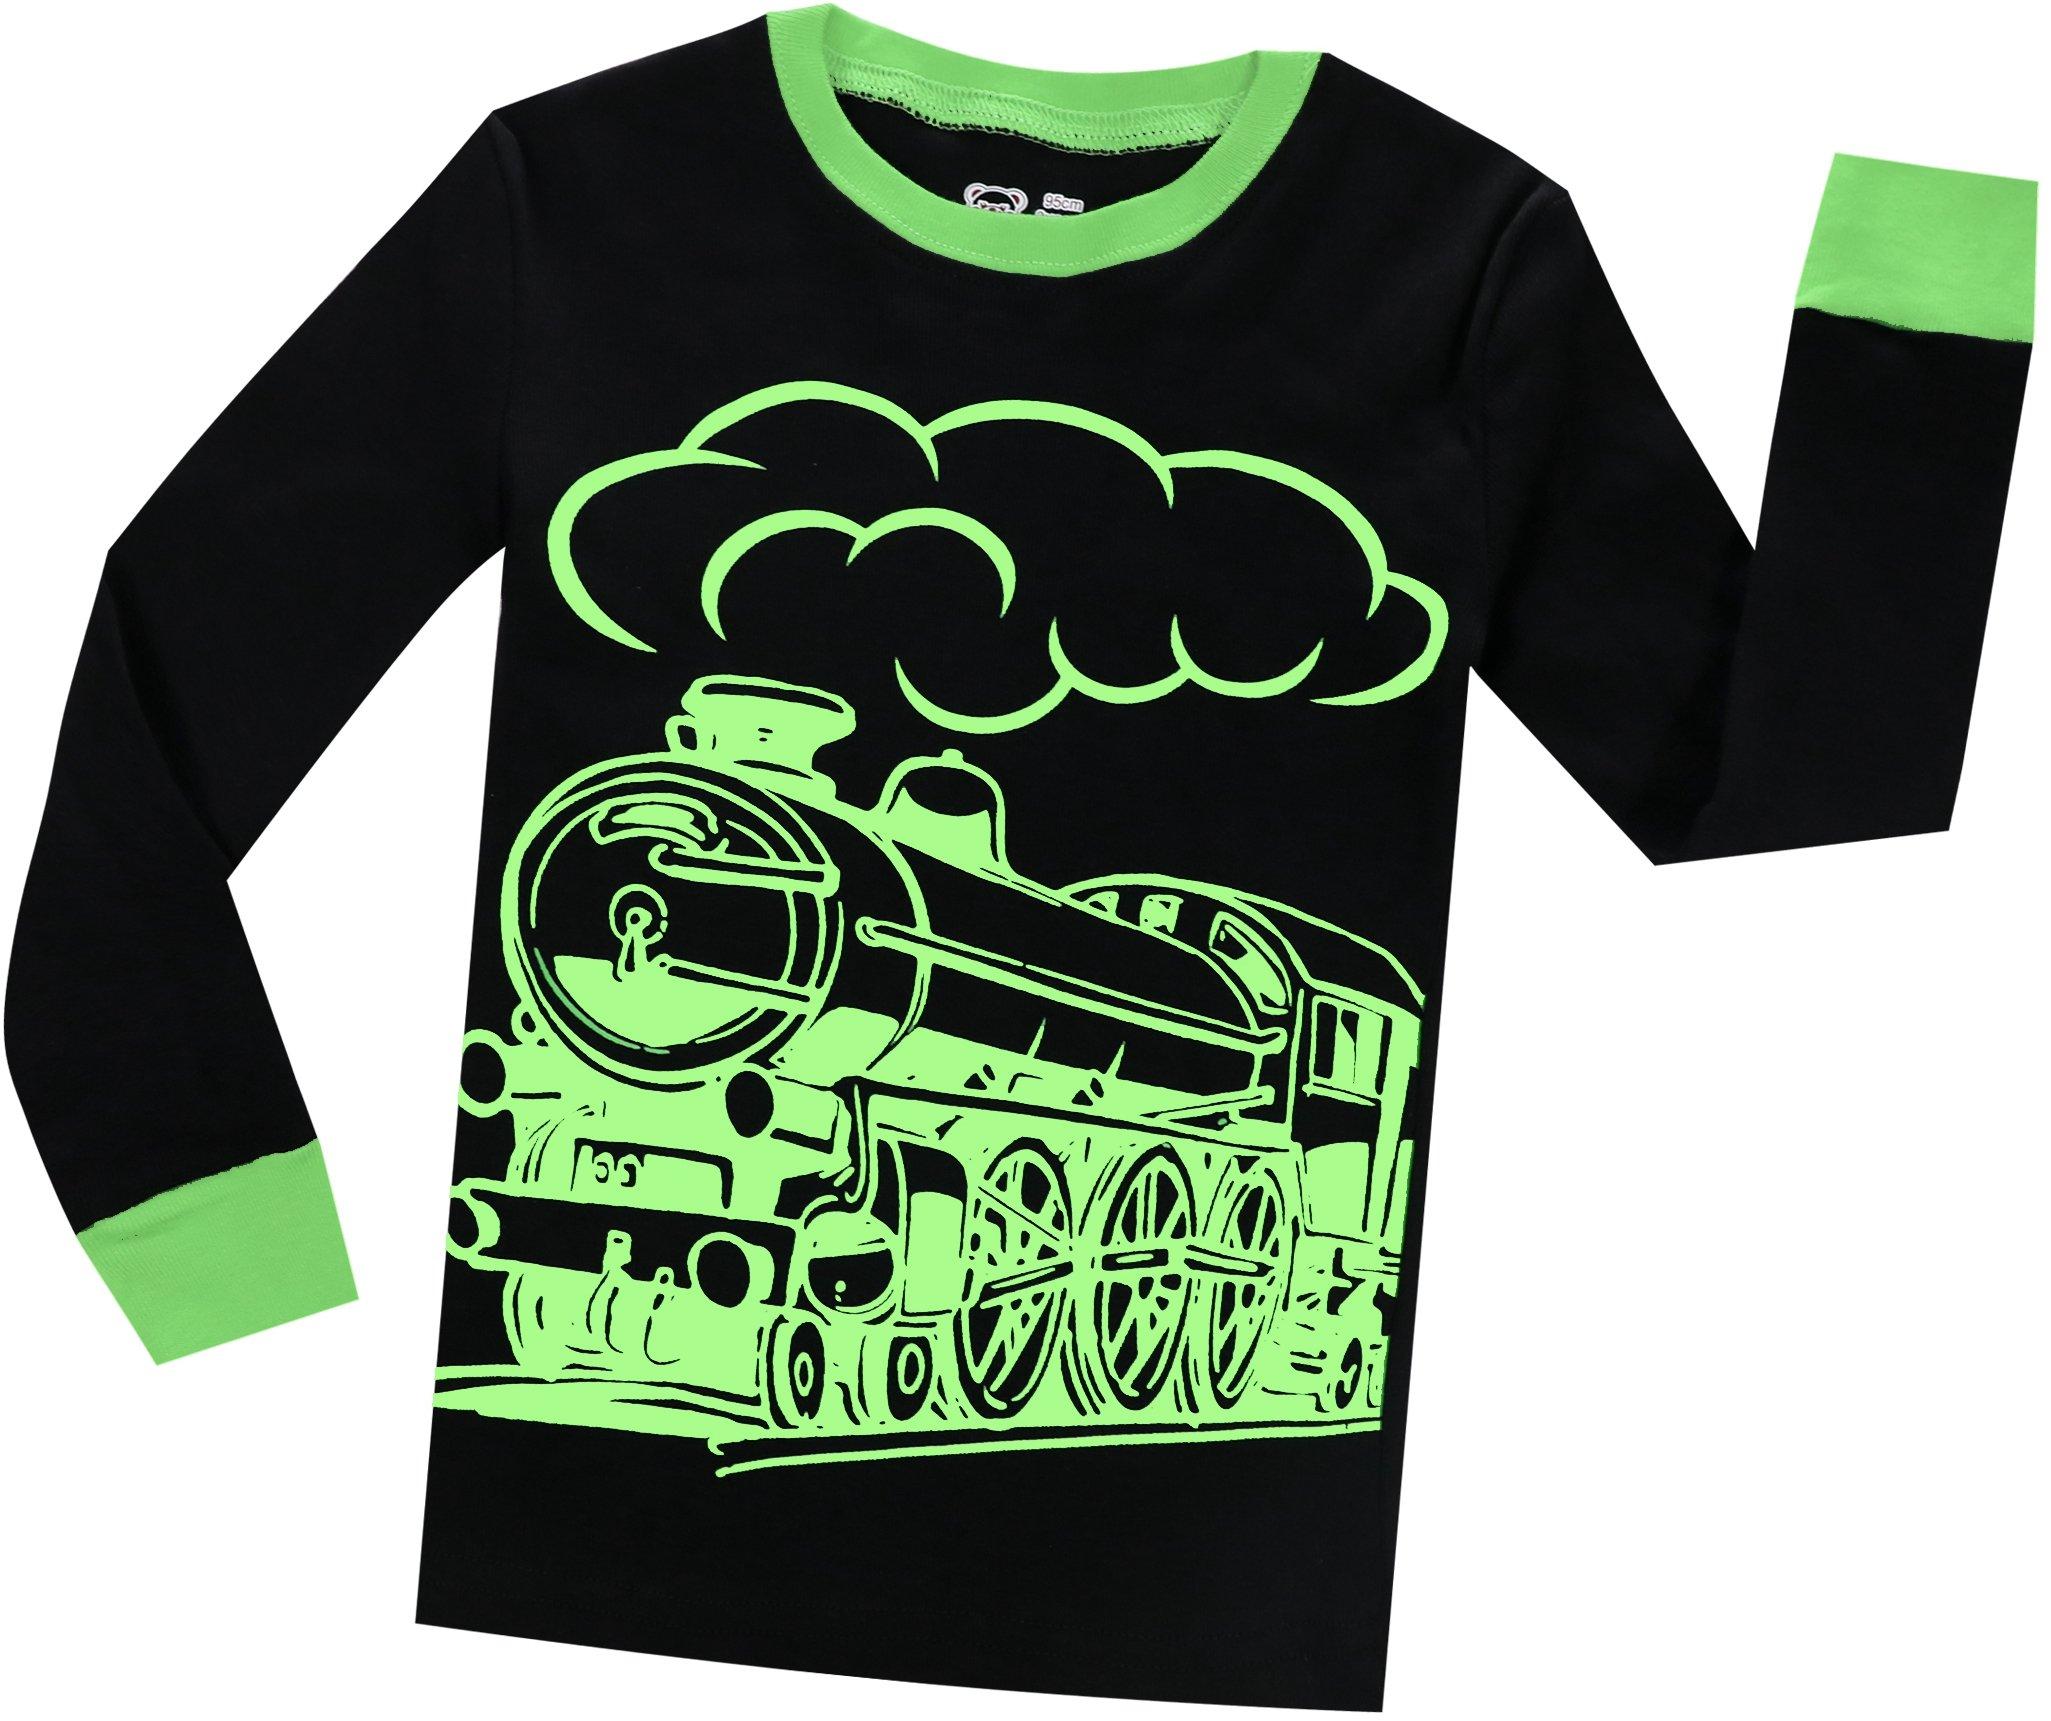 Boys Christmas Pajamas Pjs for Girls Sleepwear Children Clothes Stripe Pants Set Size 8 by BebeBear (Image #3)